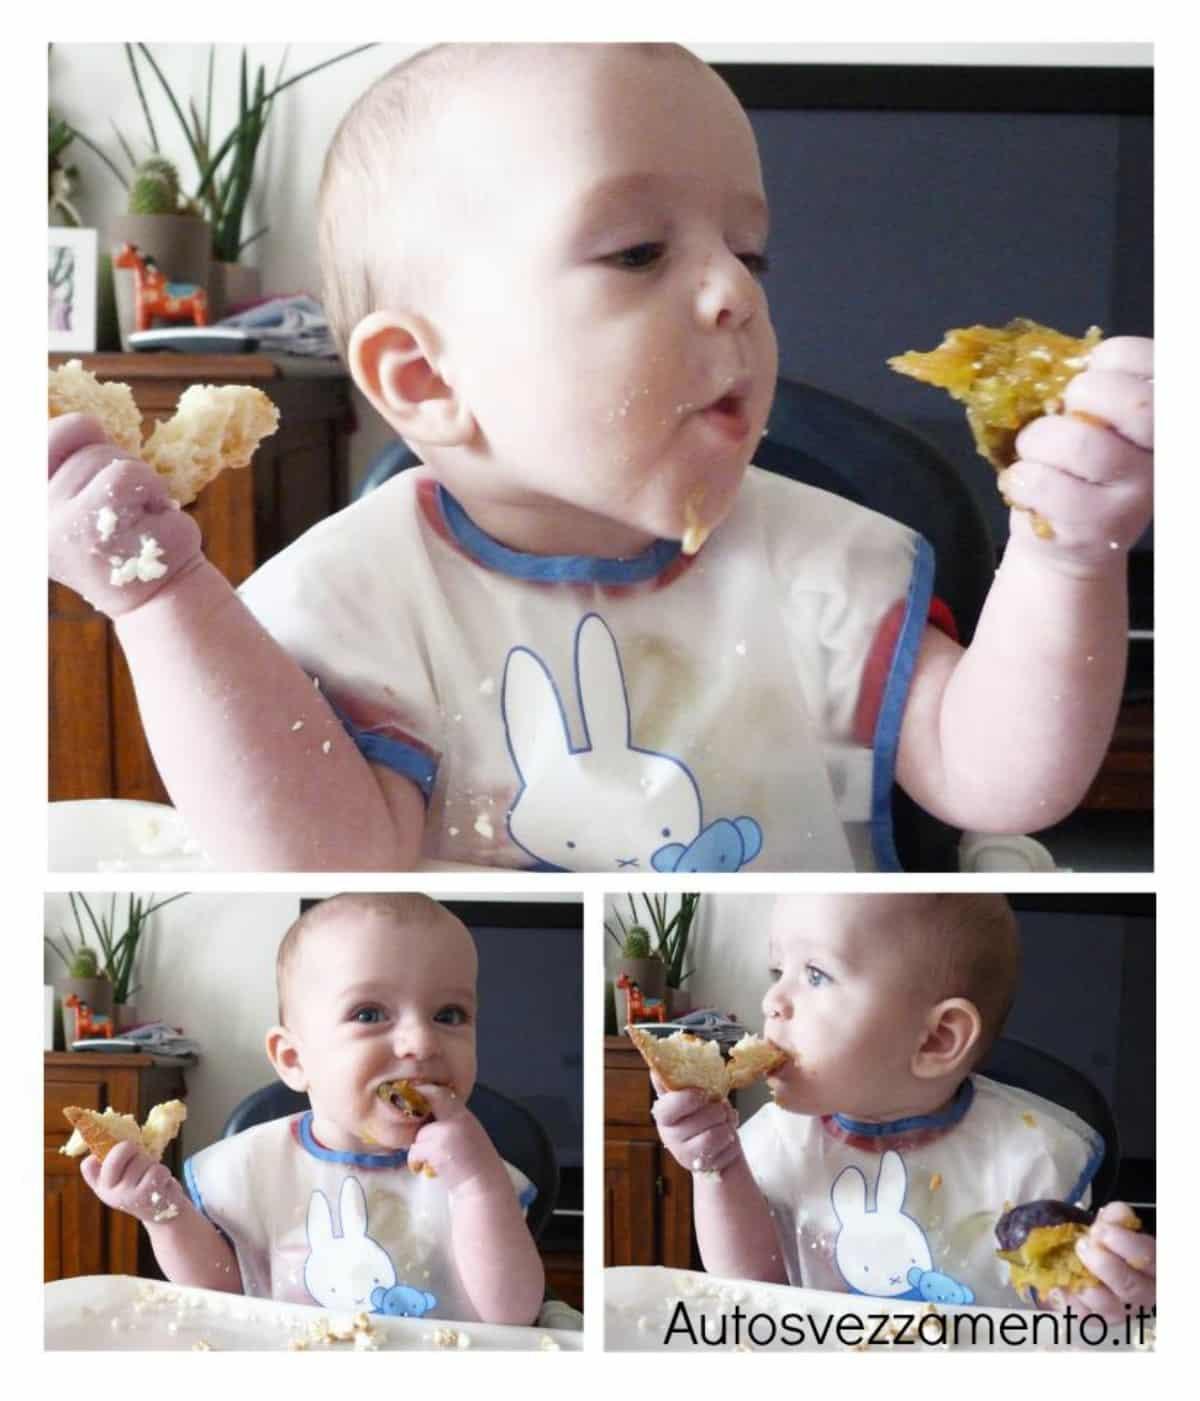 Bambina scegli cosa mangiare: prugna o pane; autosvezzamento